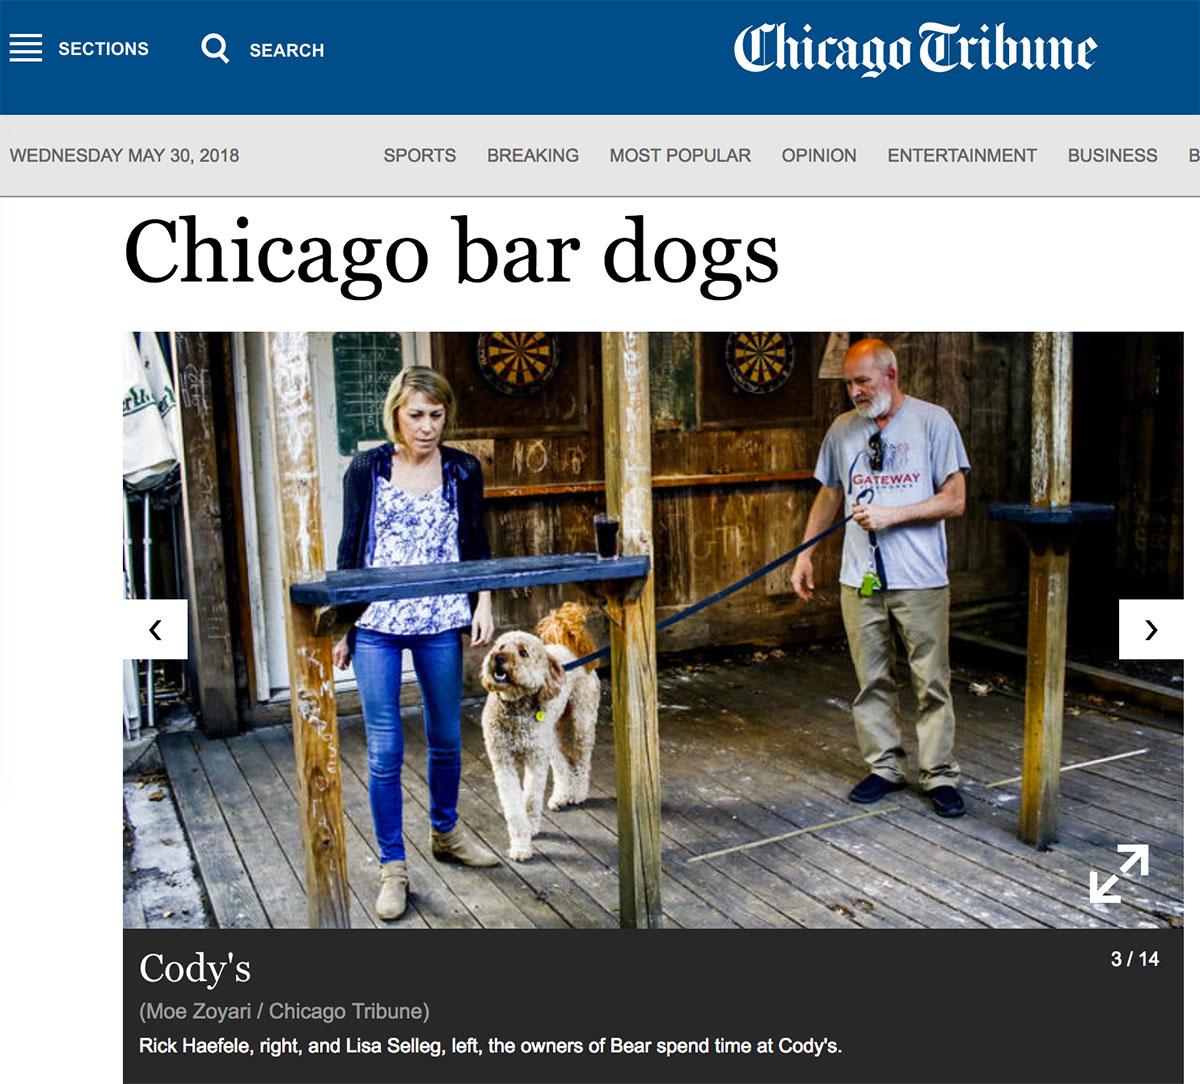 Moe_Zoyari_Chicago_Tribune_02.jpg